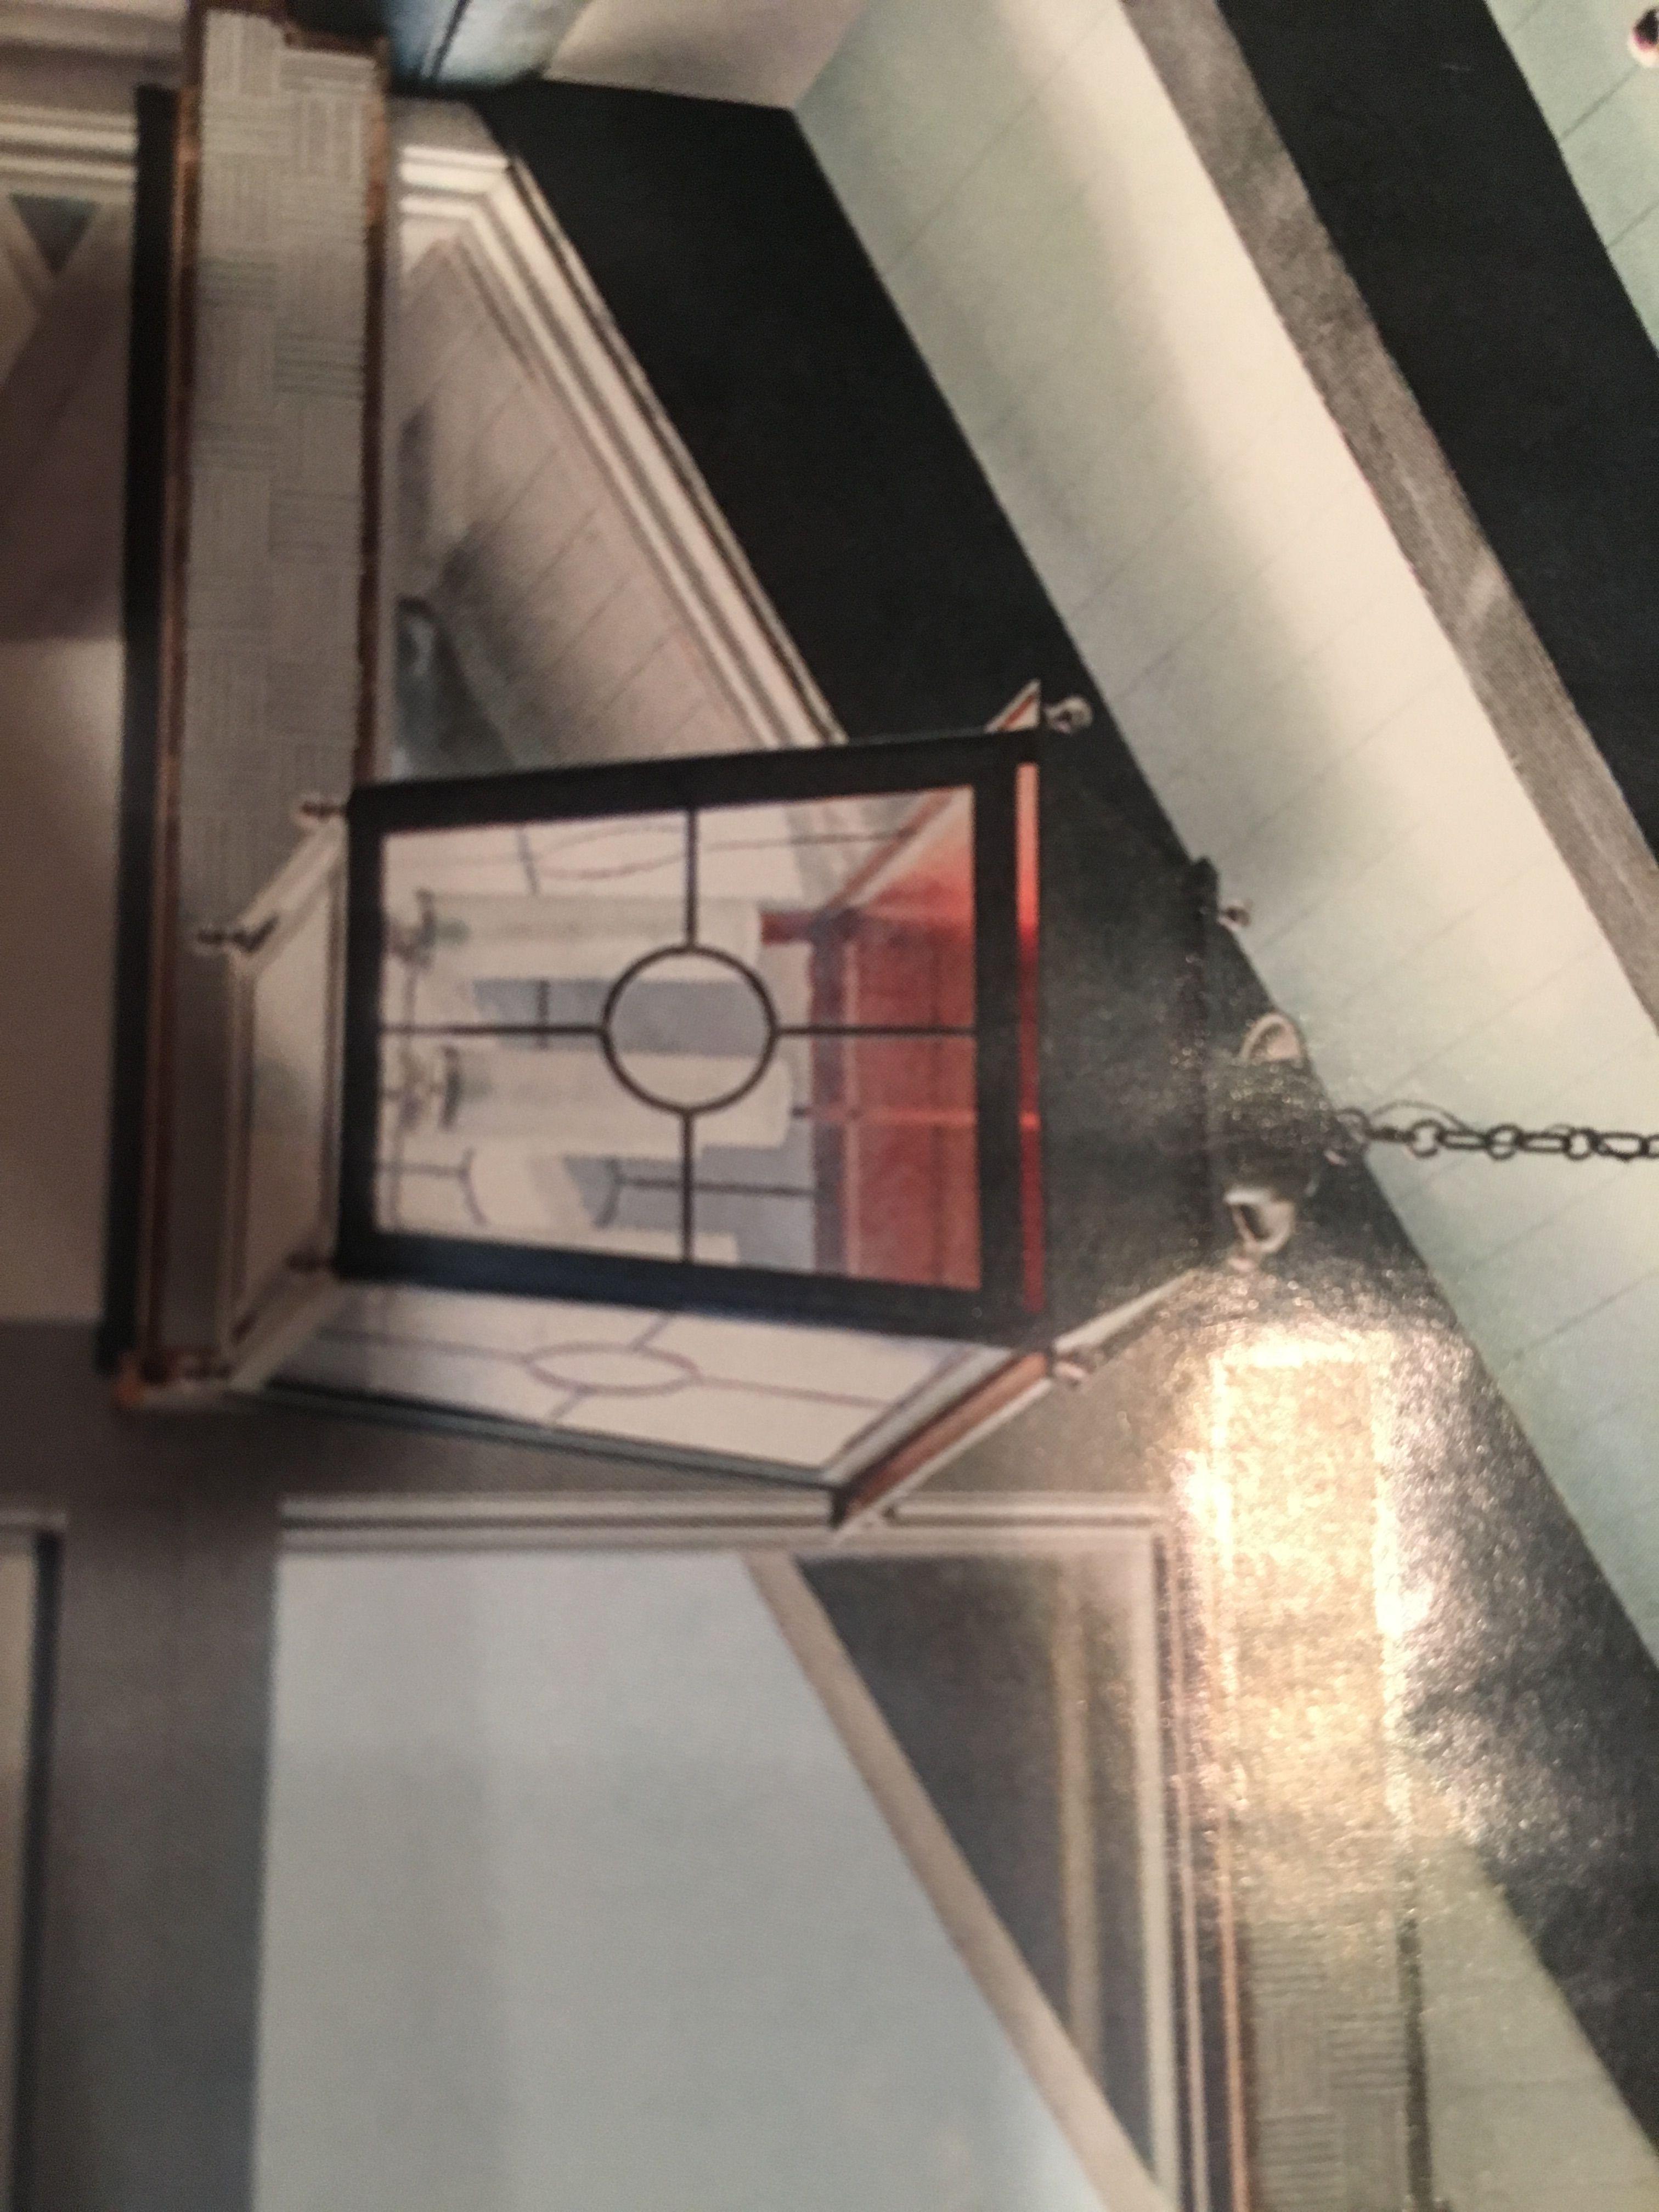 Berühmt Diy Haus Elektrische Verkabelung Galerie - Der Schaltplan ...